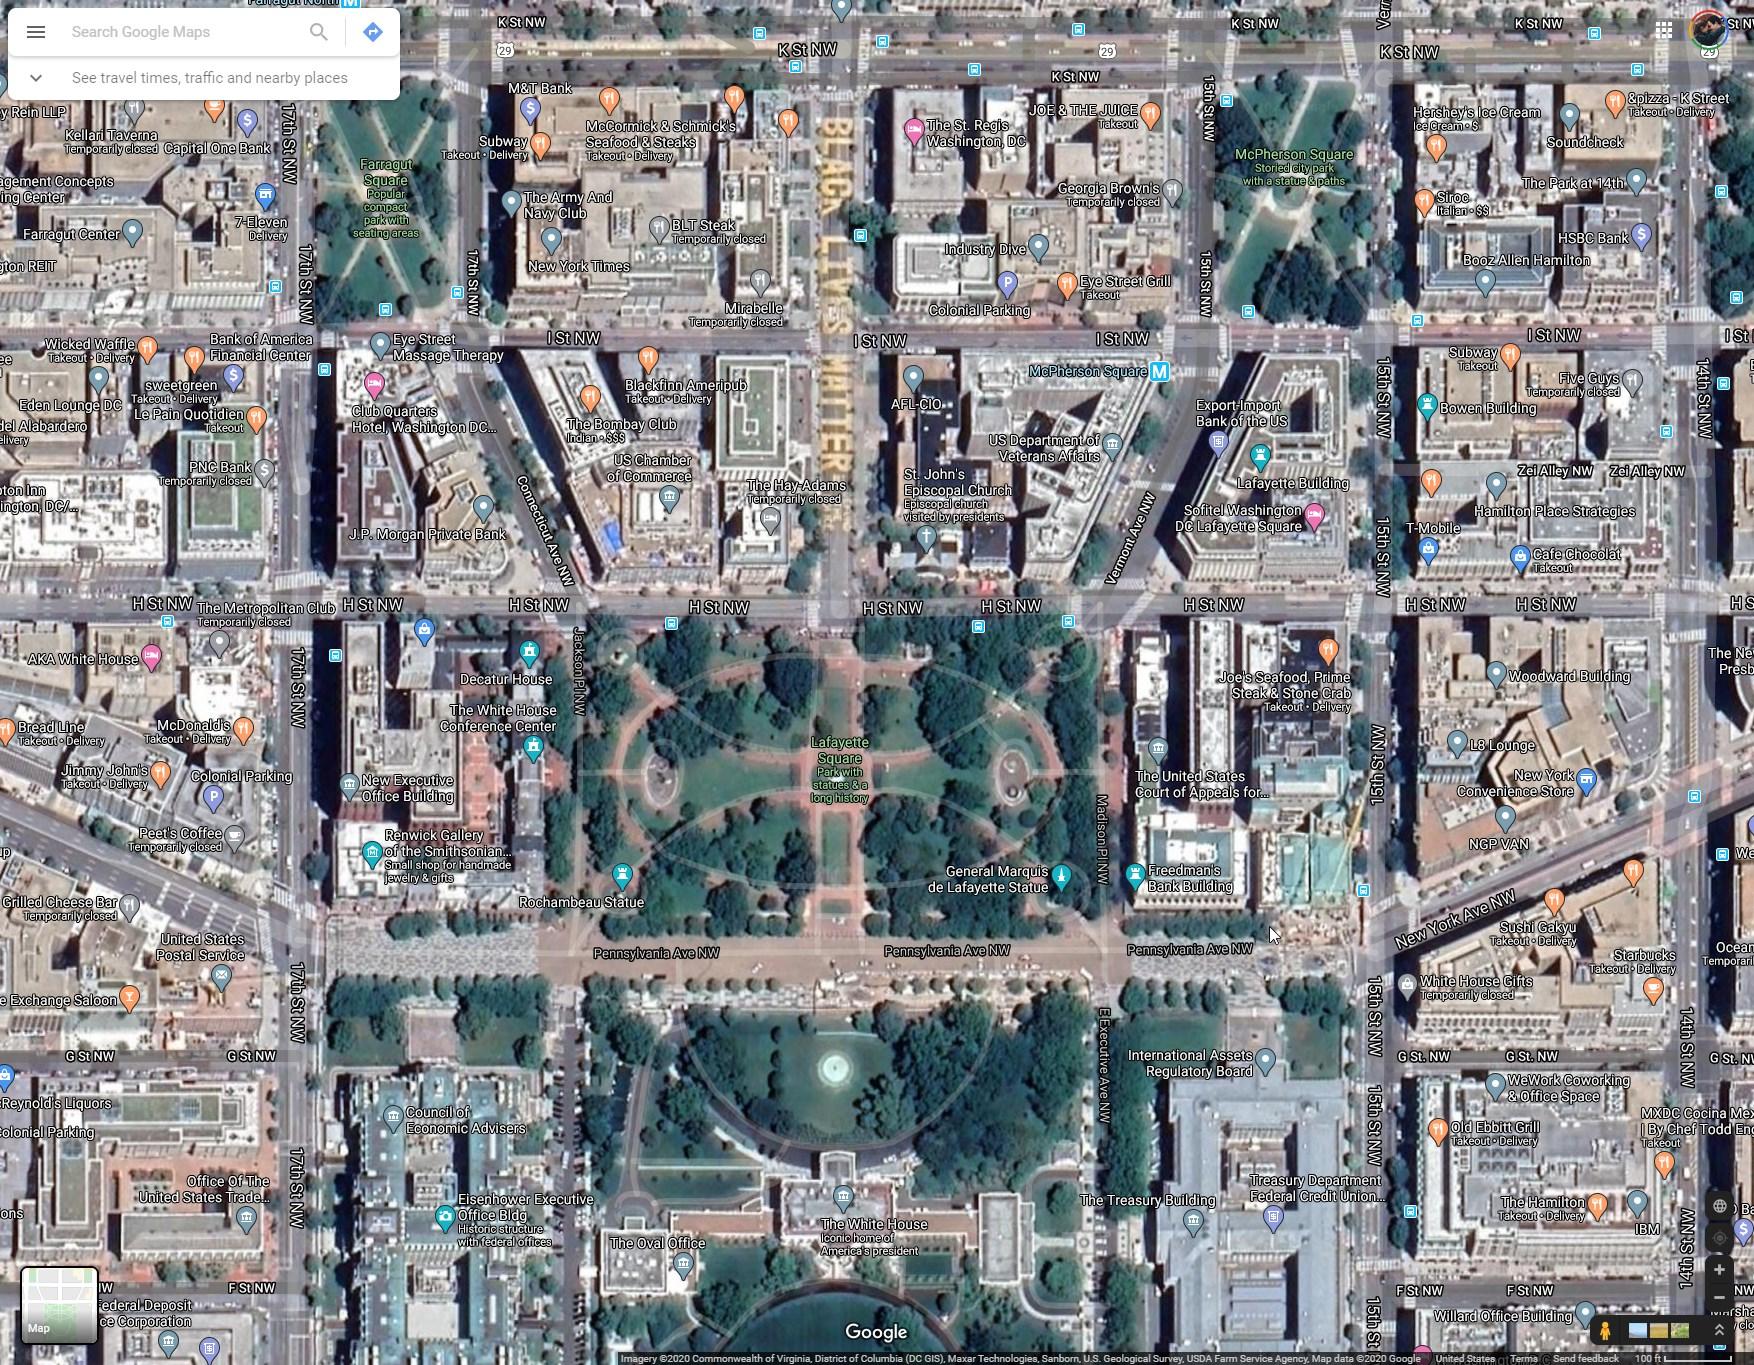 google maps black lives matter mural